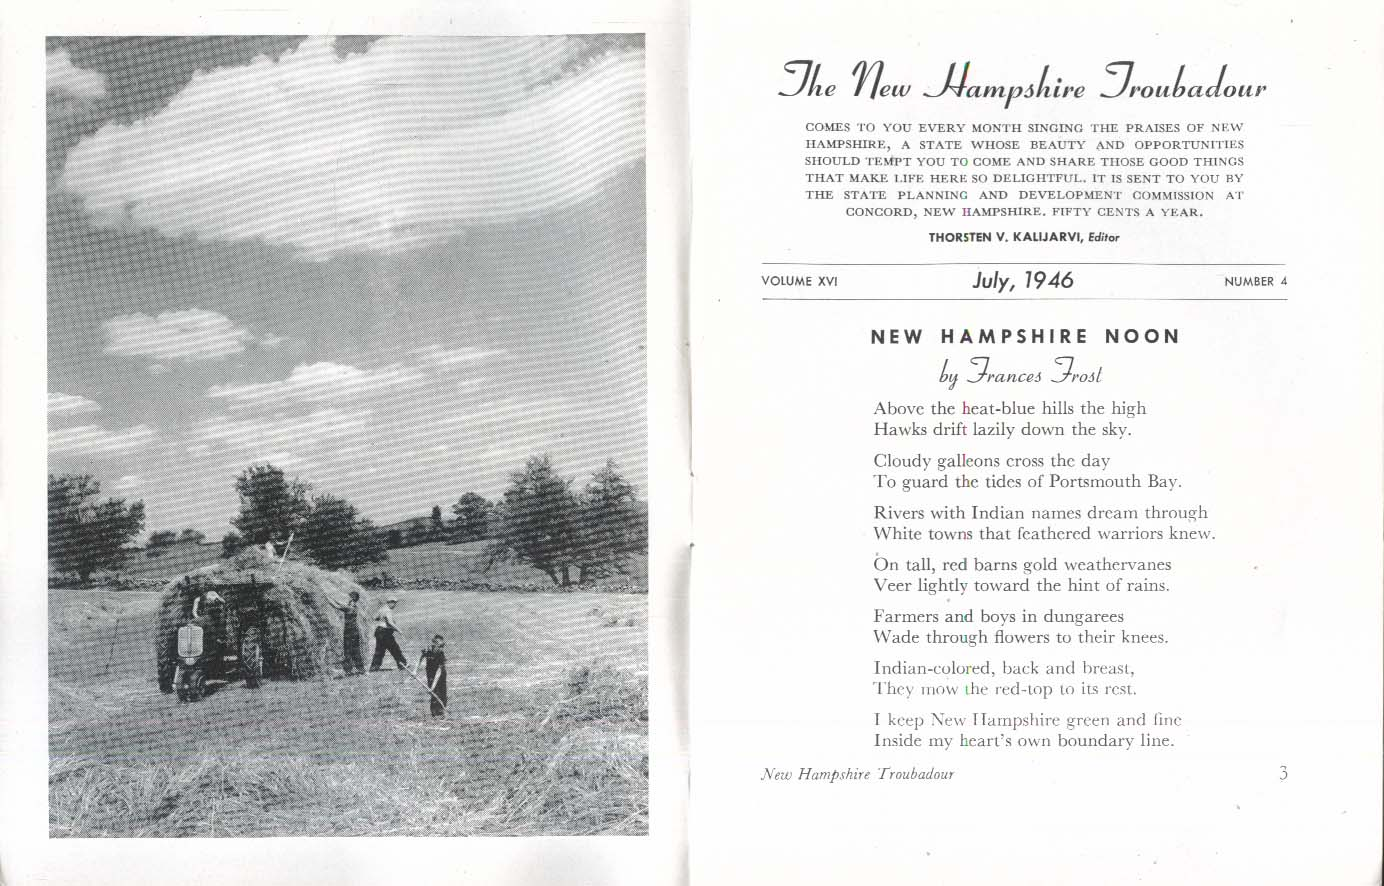 NEW HAMPSHIRE TROUBADOUR Frances Frost Pauline Soroka Chadwell 7 1946